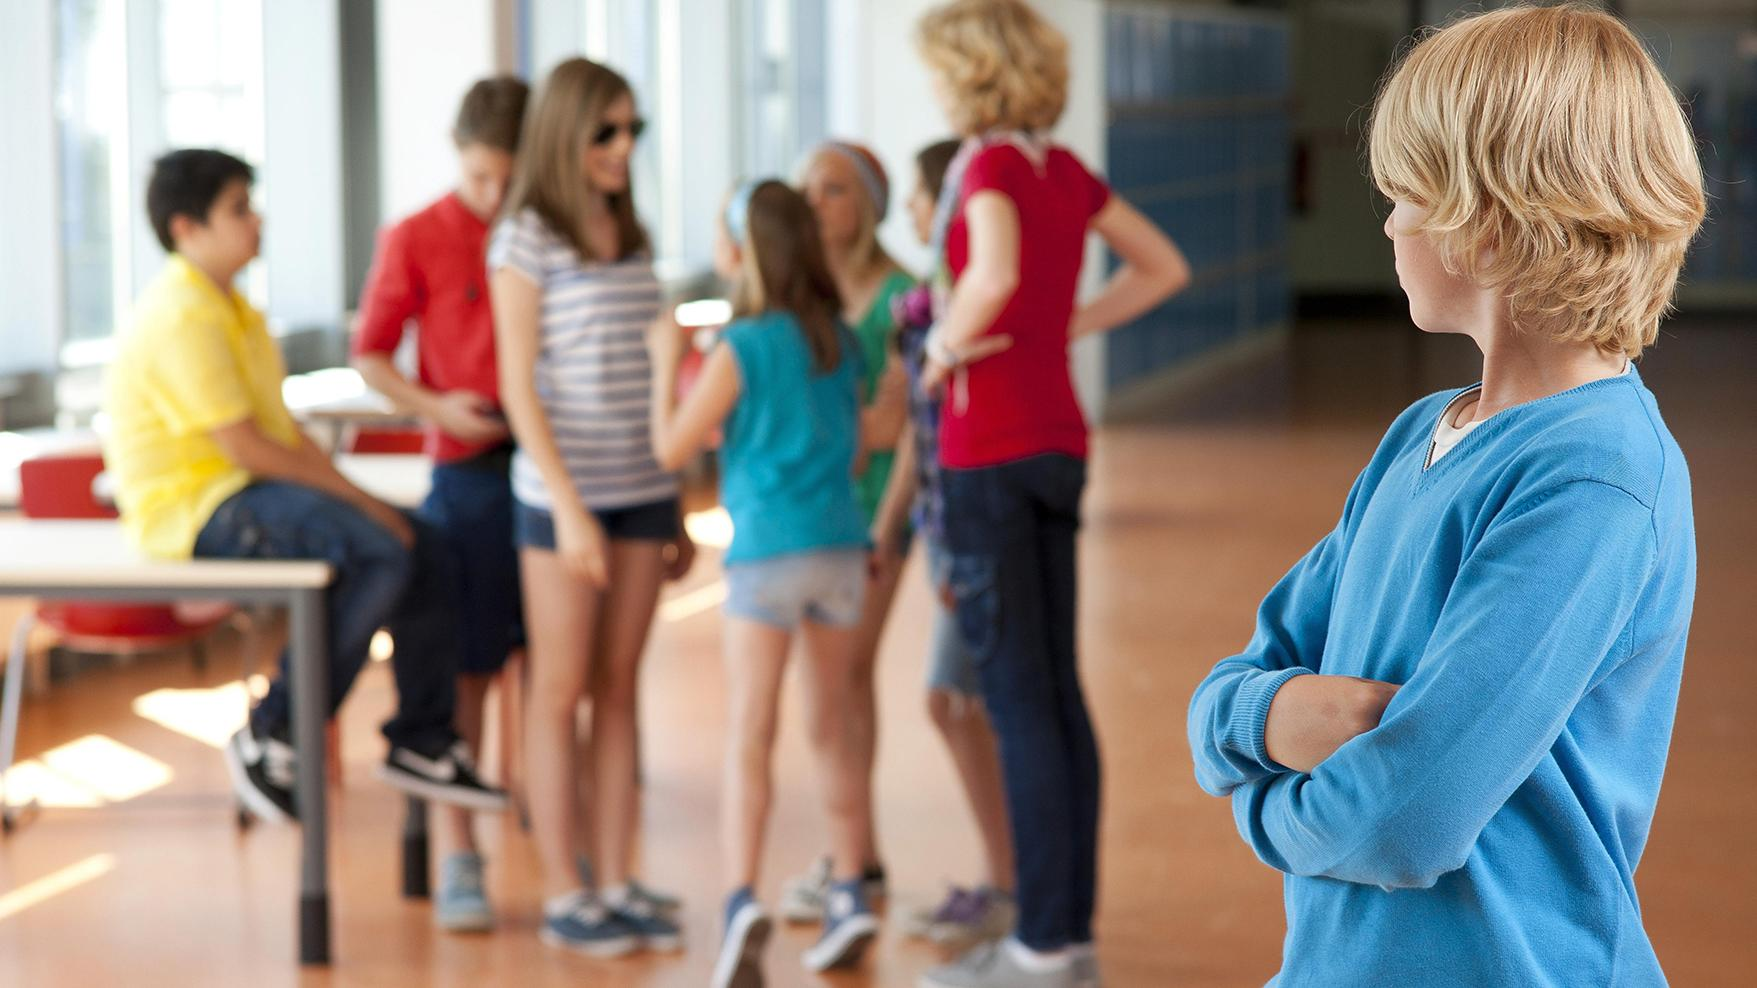 Mobbing in der Schule: Wo finden Kinder Hilfe?